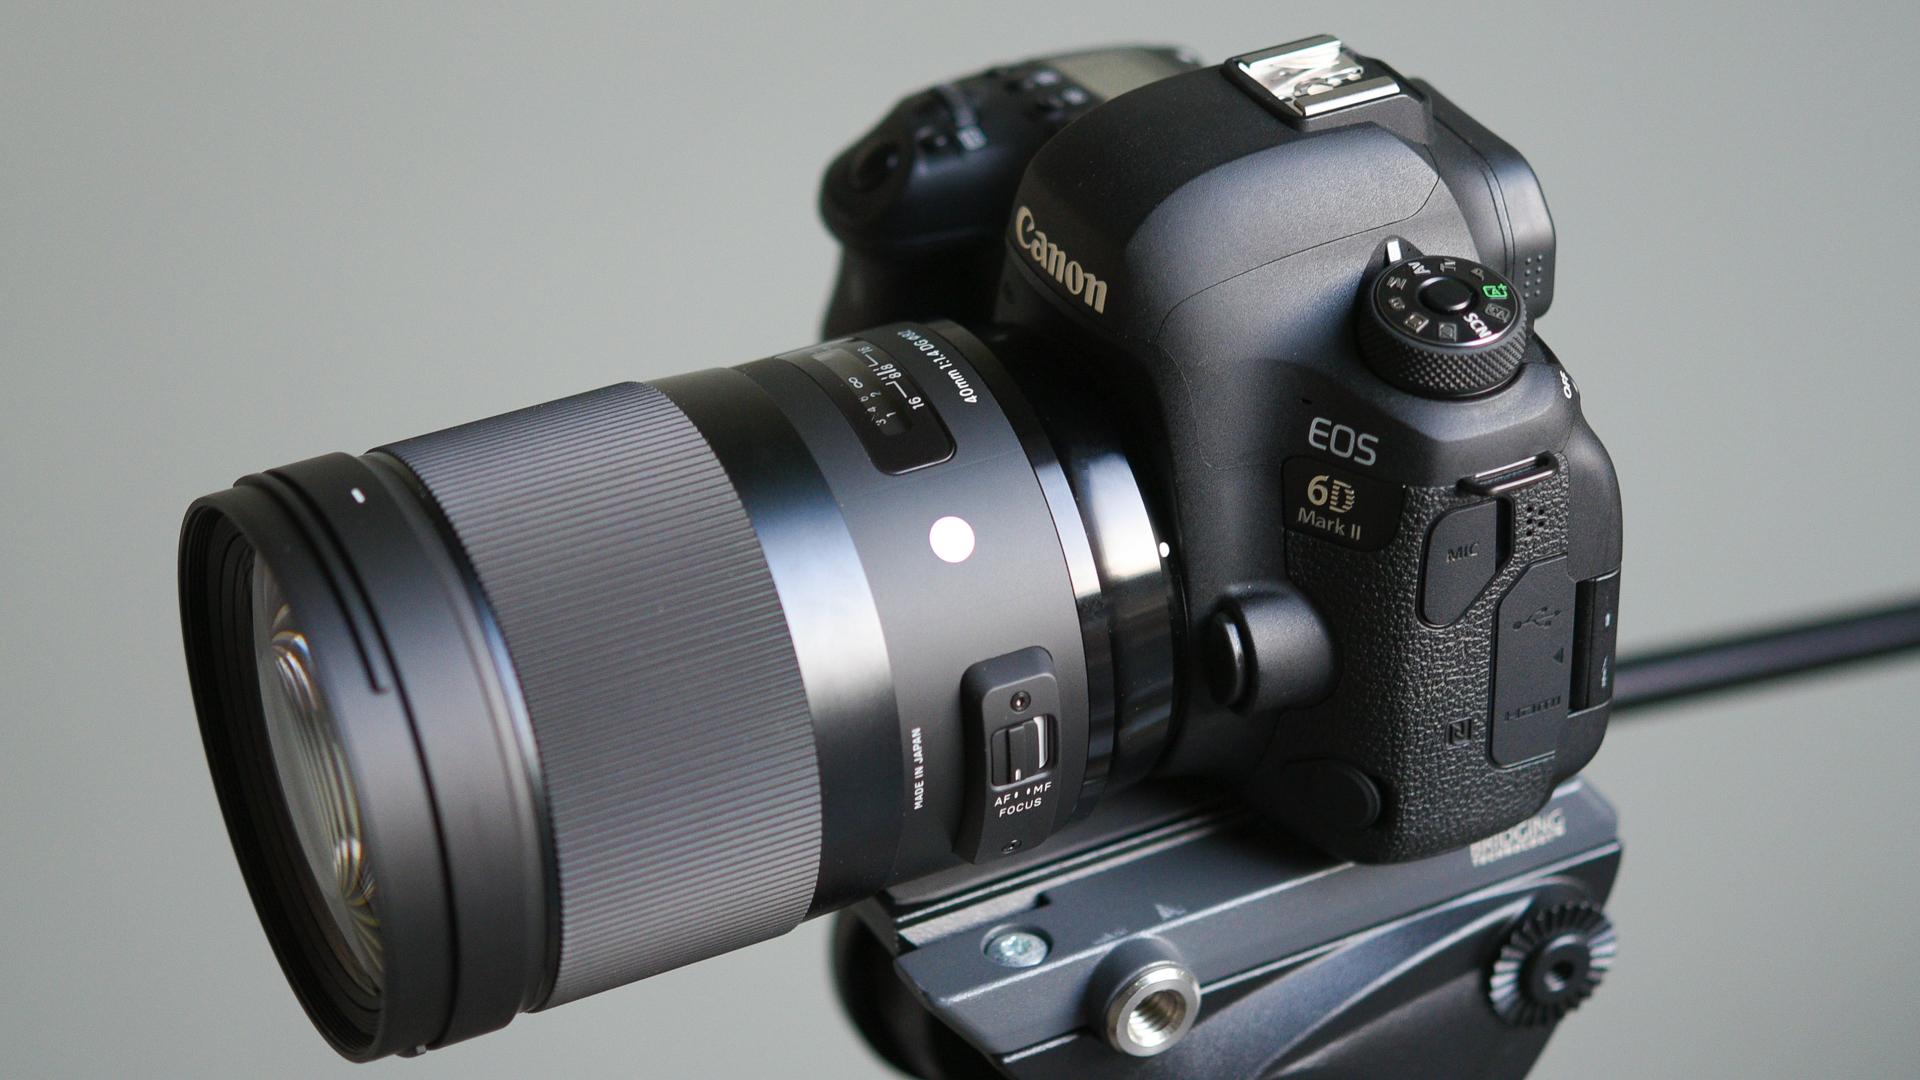 Sigma 40mm f/1 4 DG HSM   Art review   TechRadar